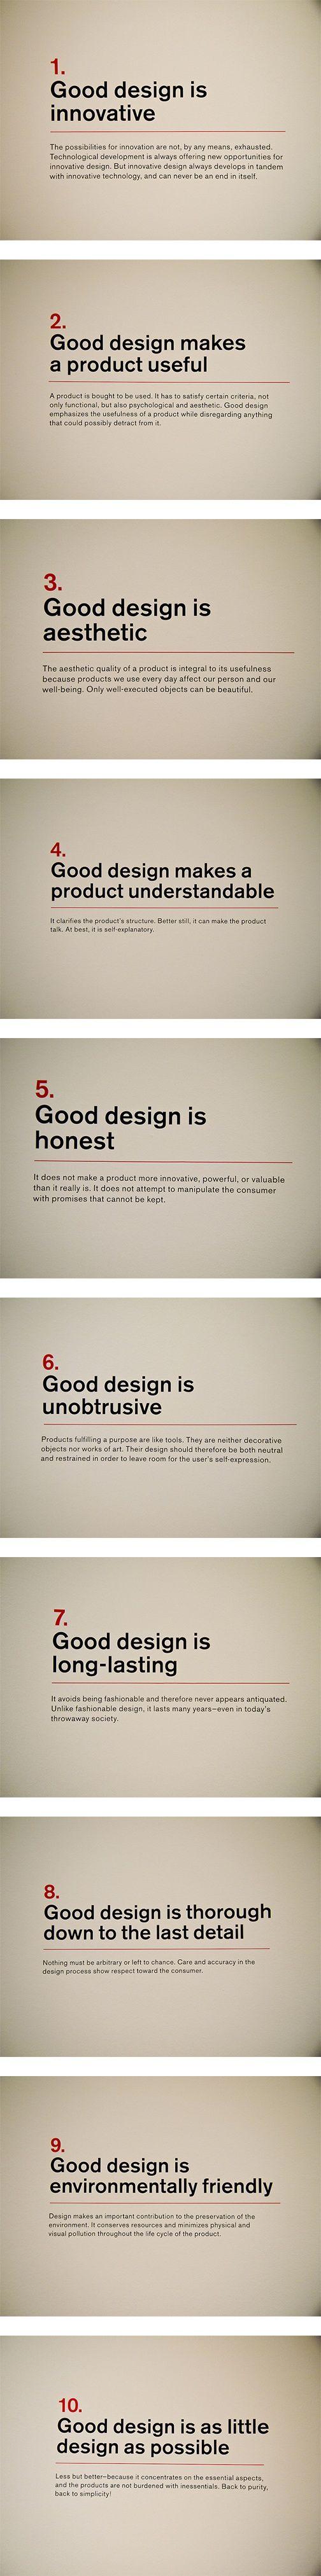 "Dieter Rams' ""Ten principles for Good Design"""